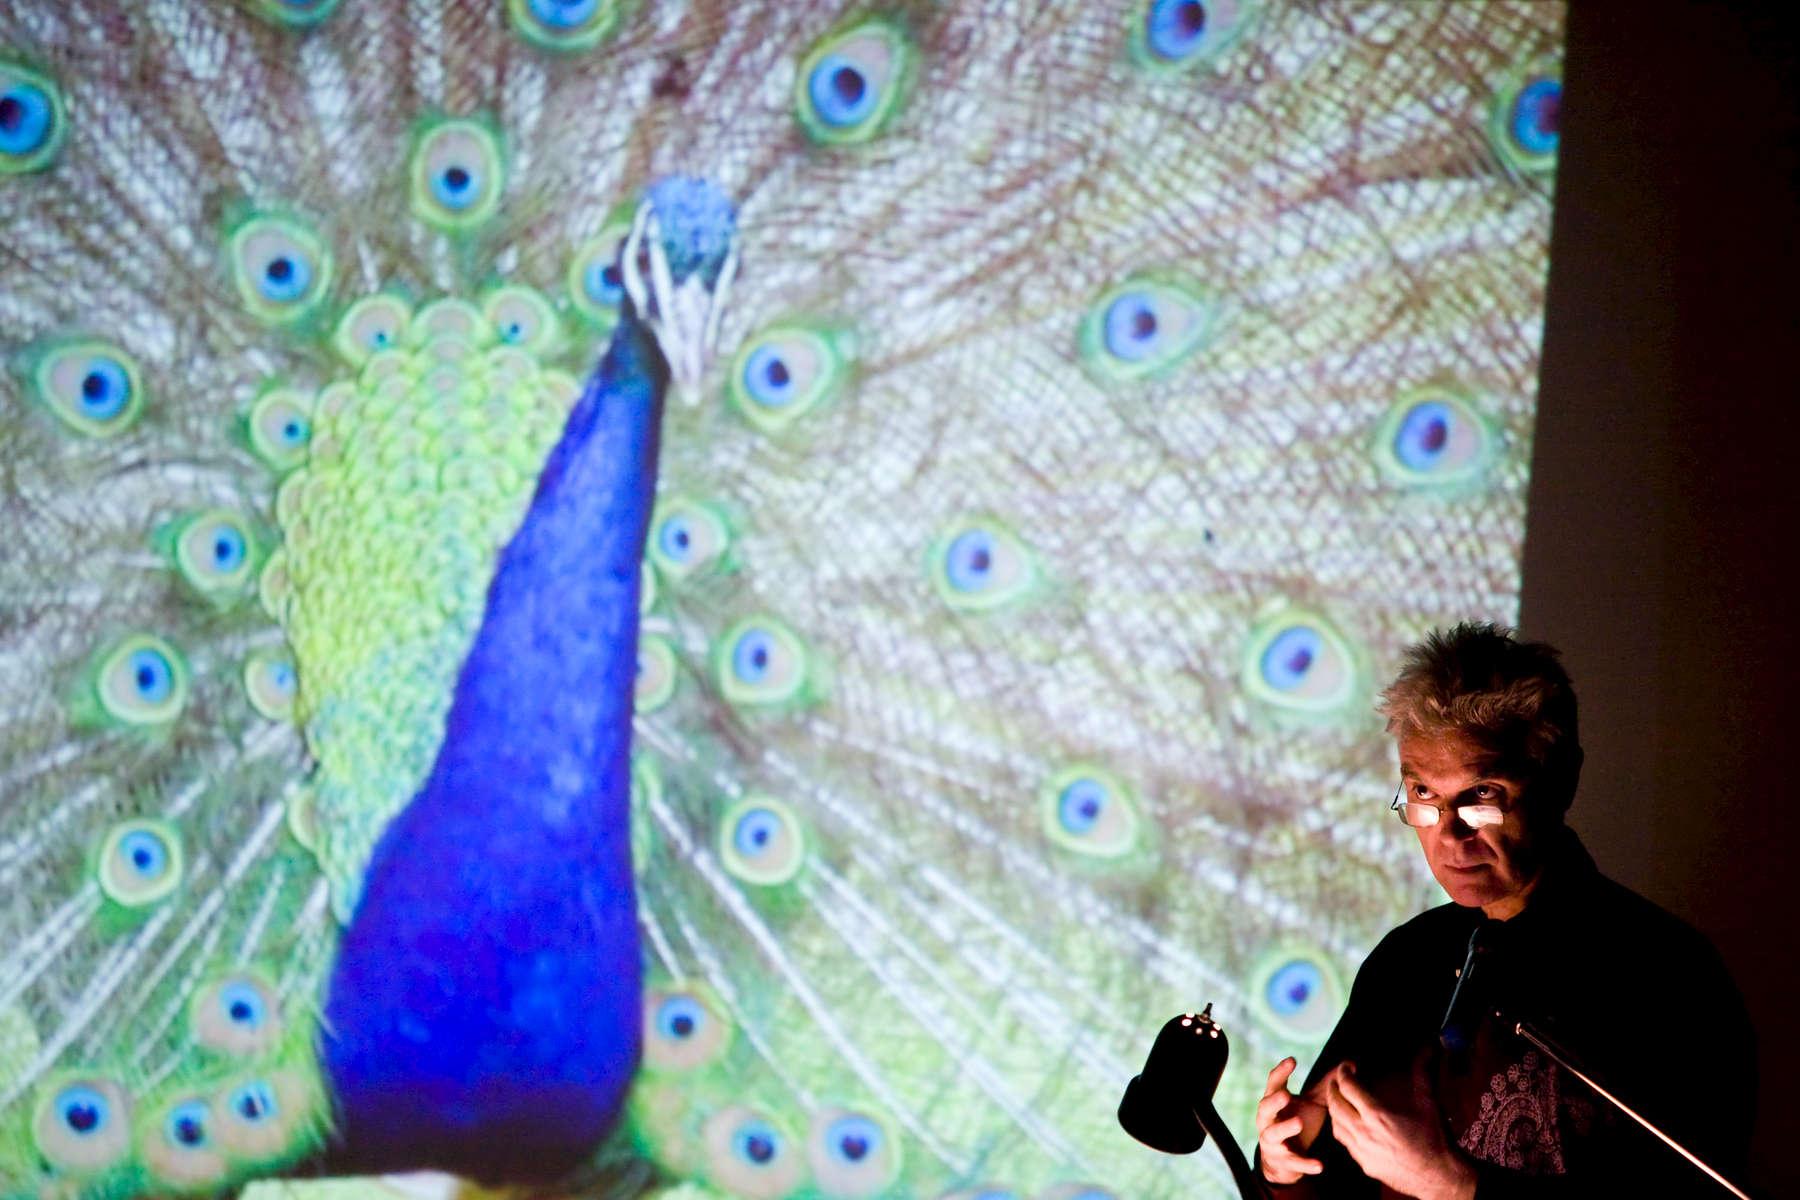 David Byrne, Talking Heads lead singer lectures at Yale University's School of Art. Yale Alumni Magazine